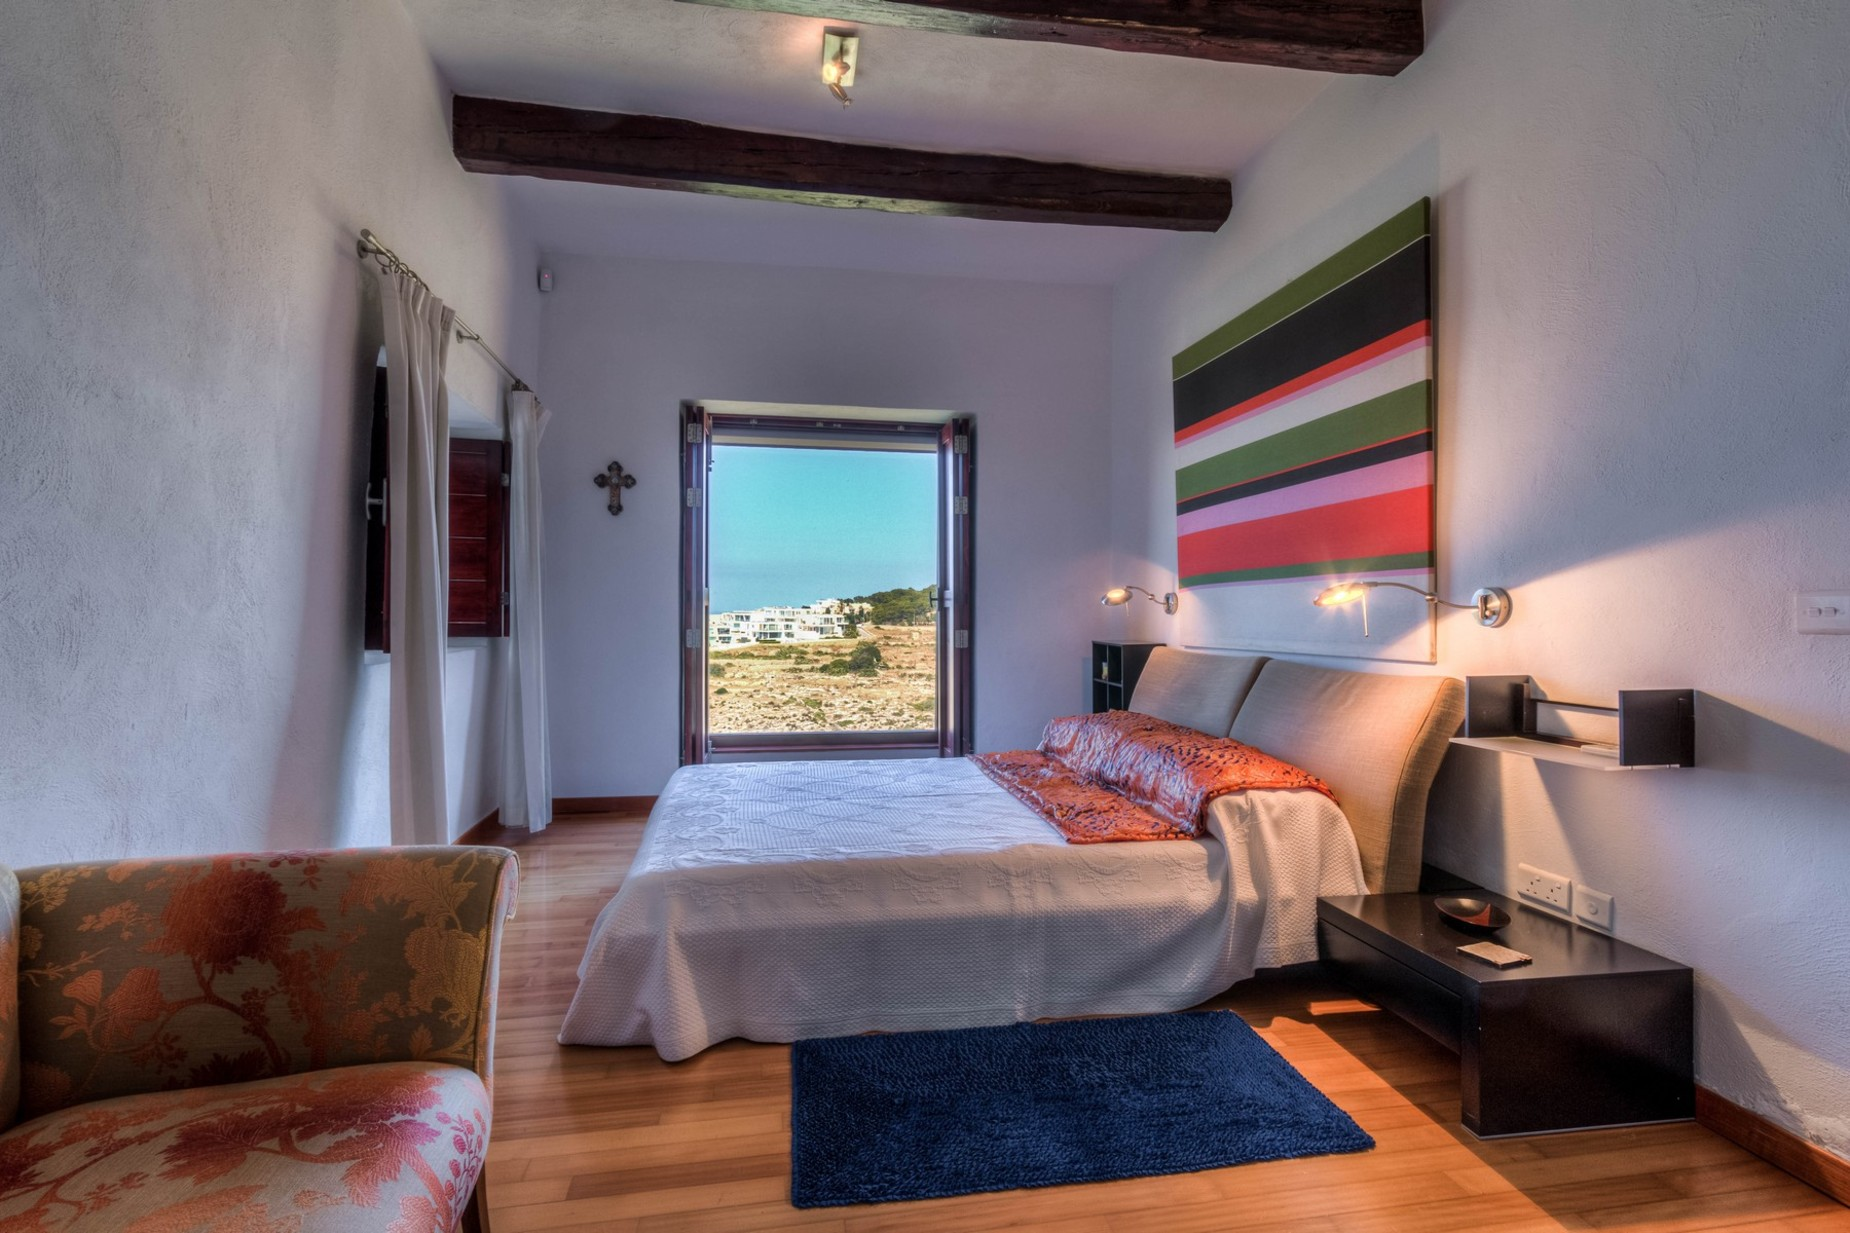 4 bed Villa For Sale in Gharghur, Gharghur - thumb 8